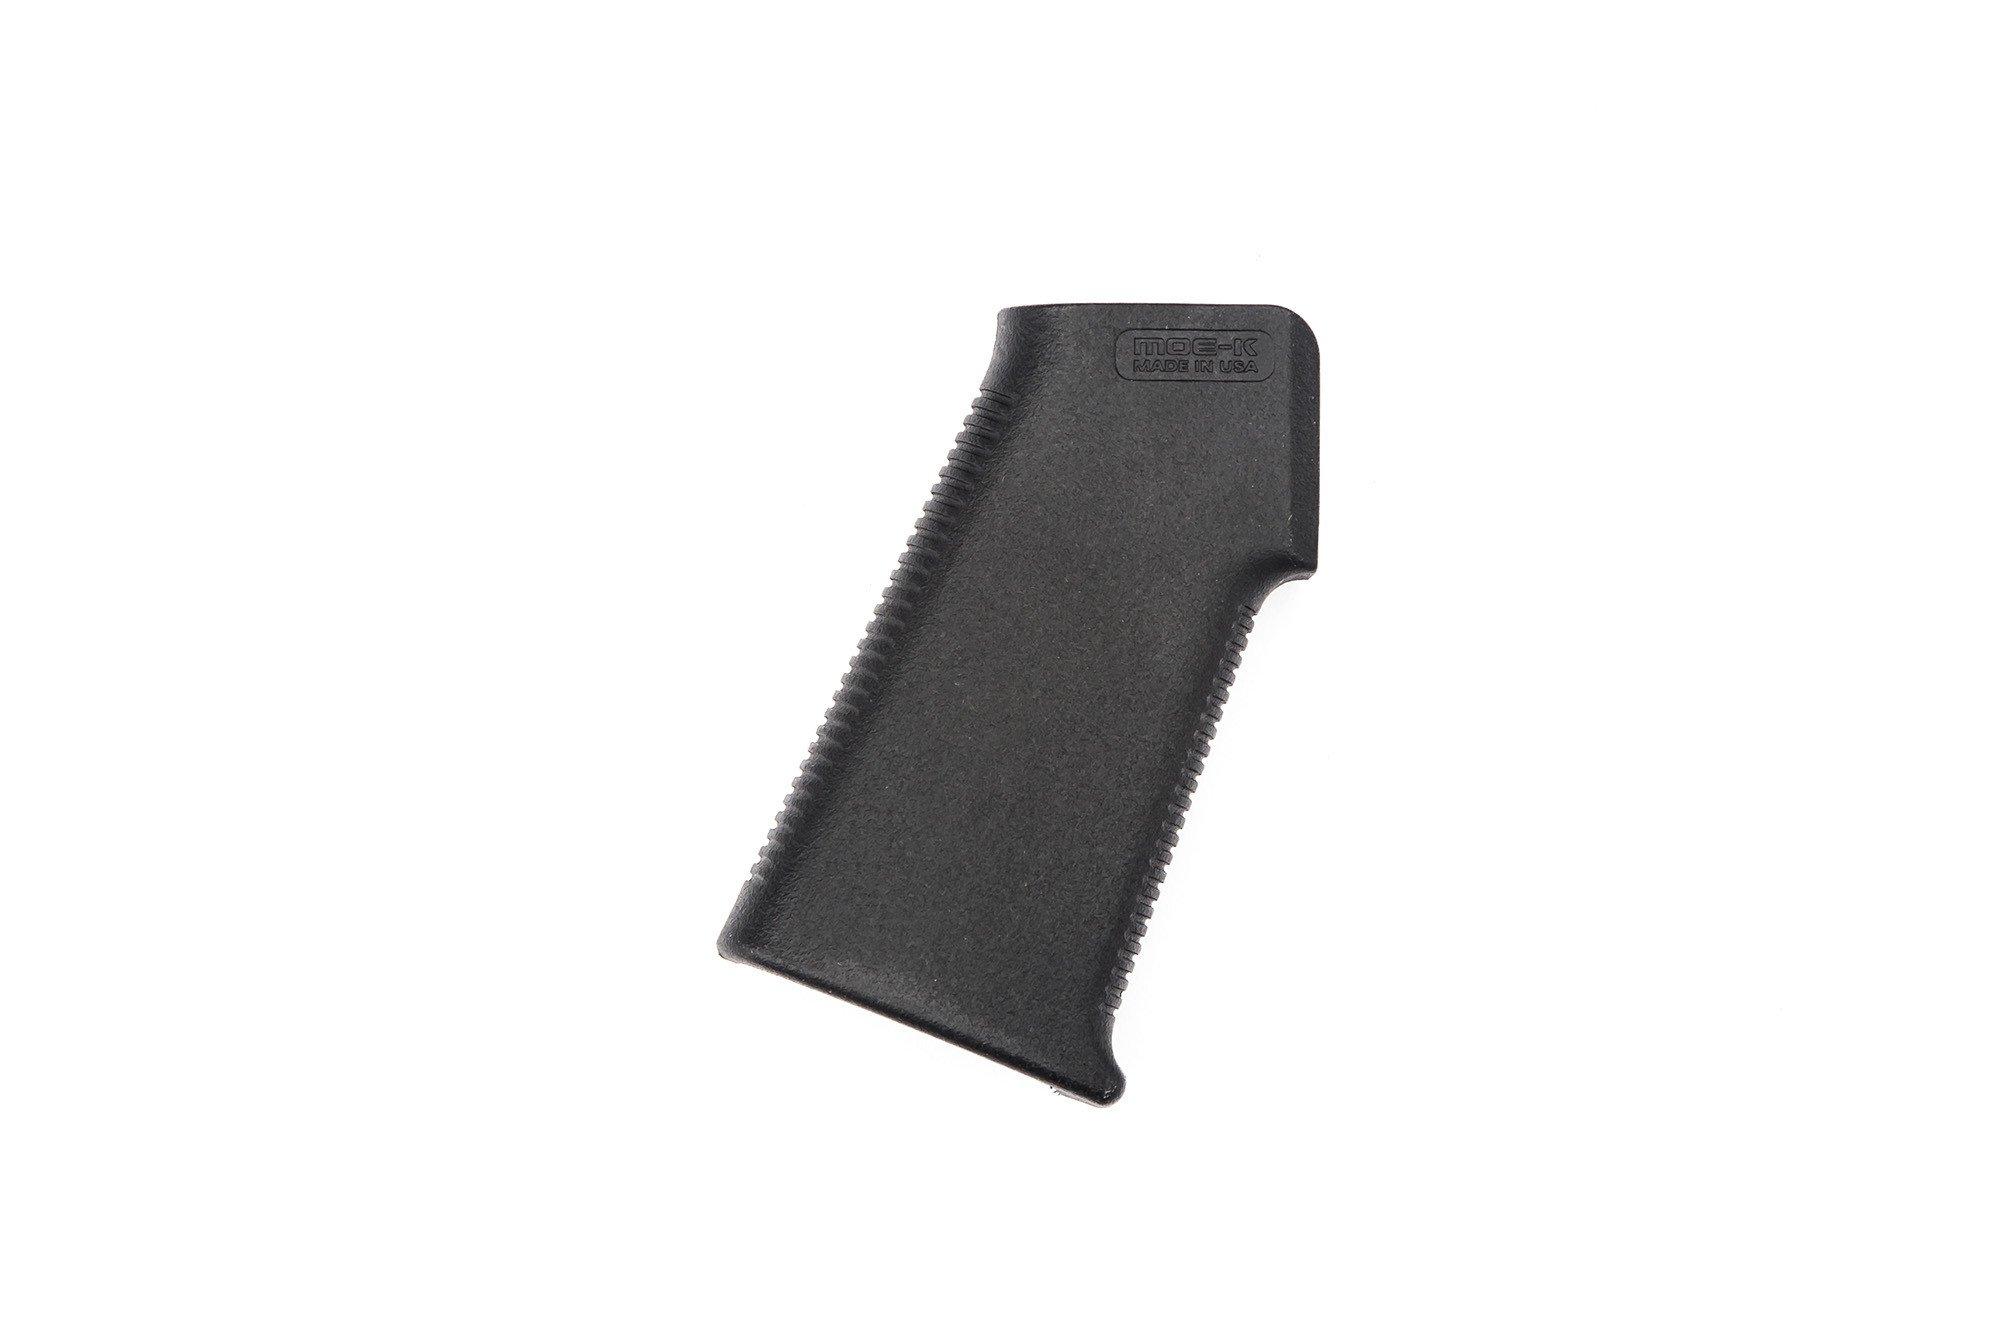 Magpul MOE-K Grip